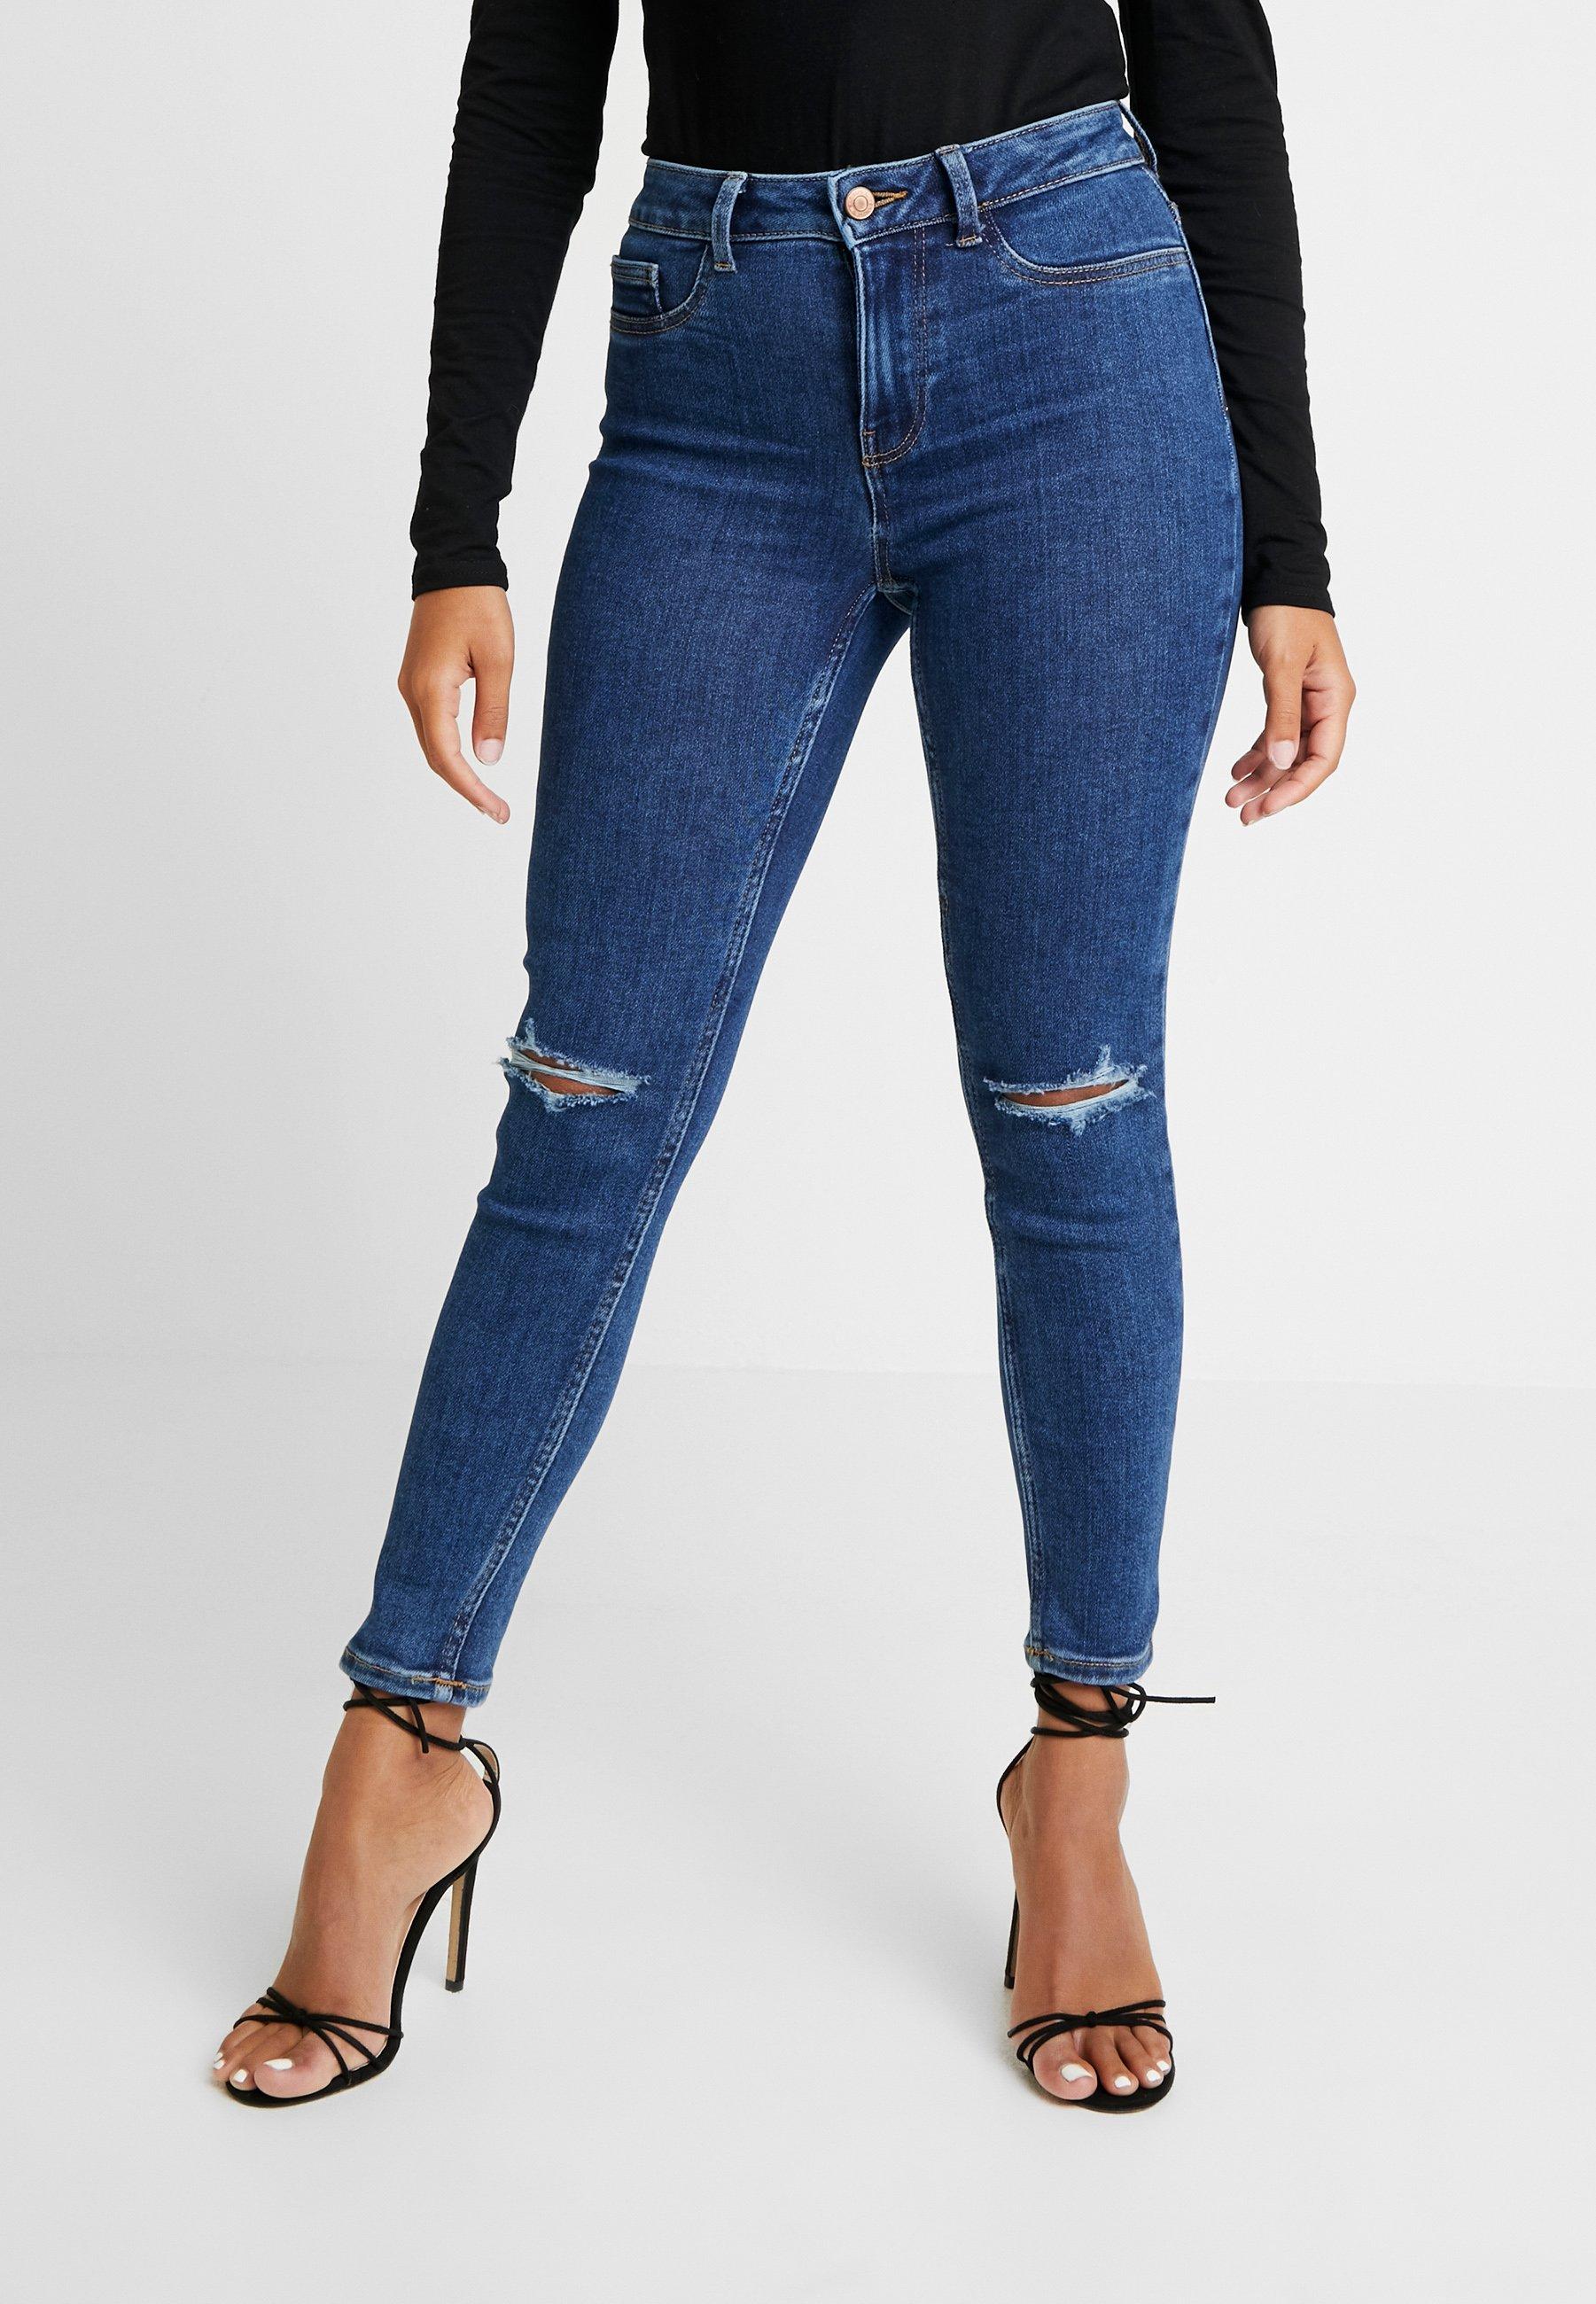 New Look Petite HALLIE RIP DISCO - Jeans Skinny Fit mid blue